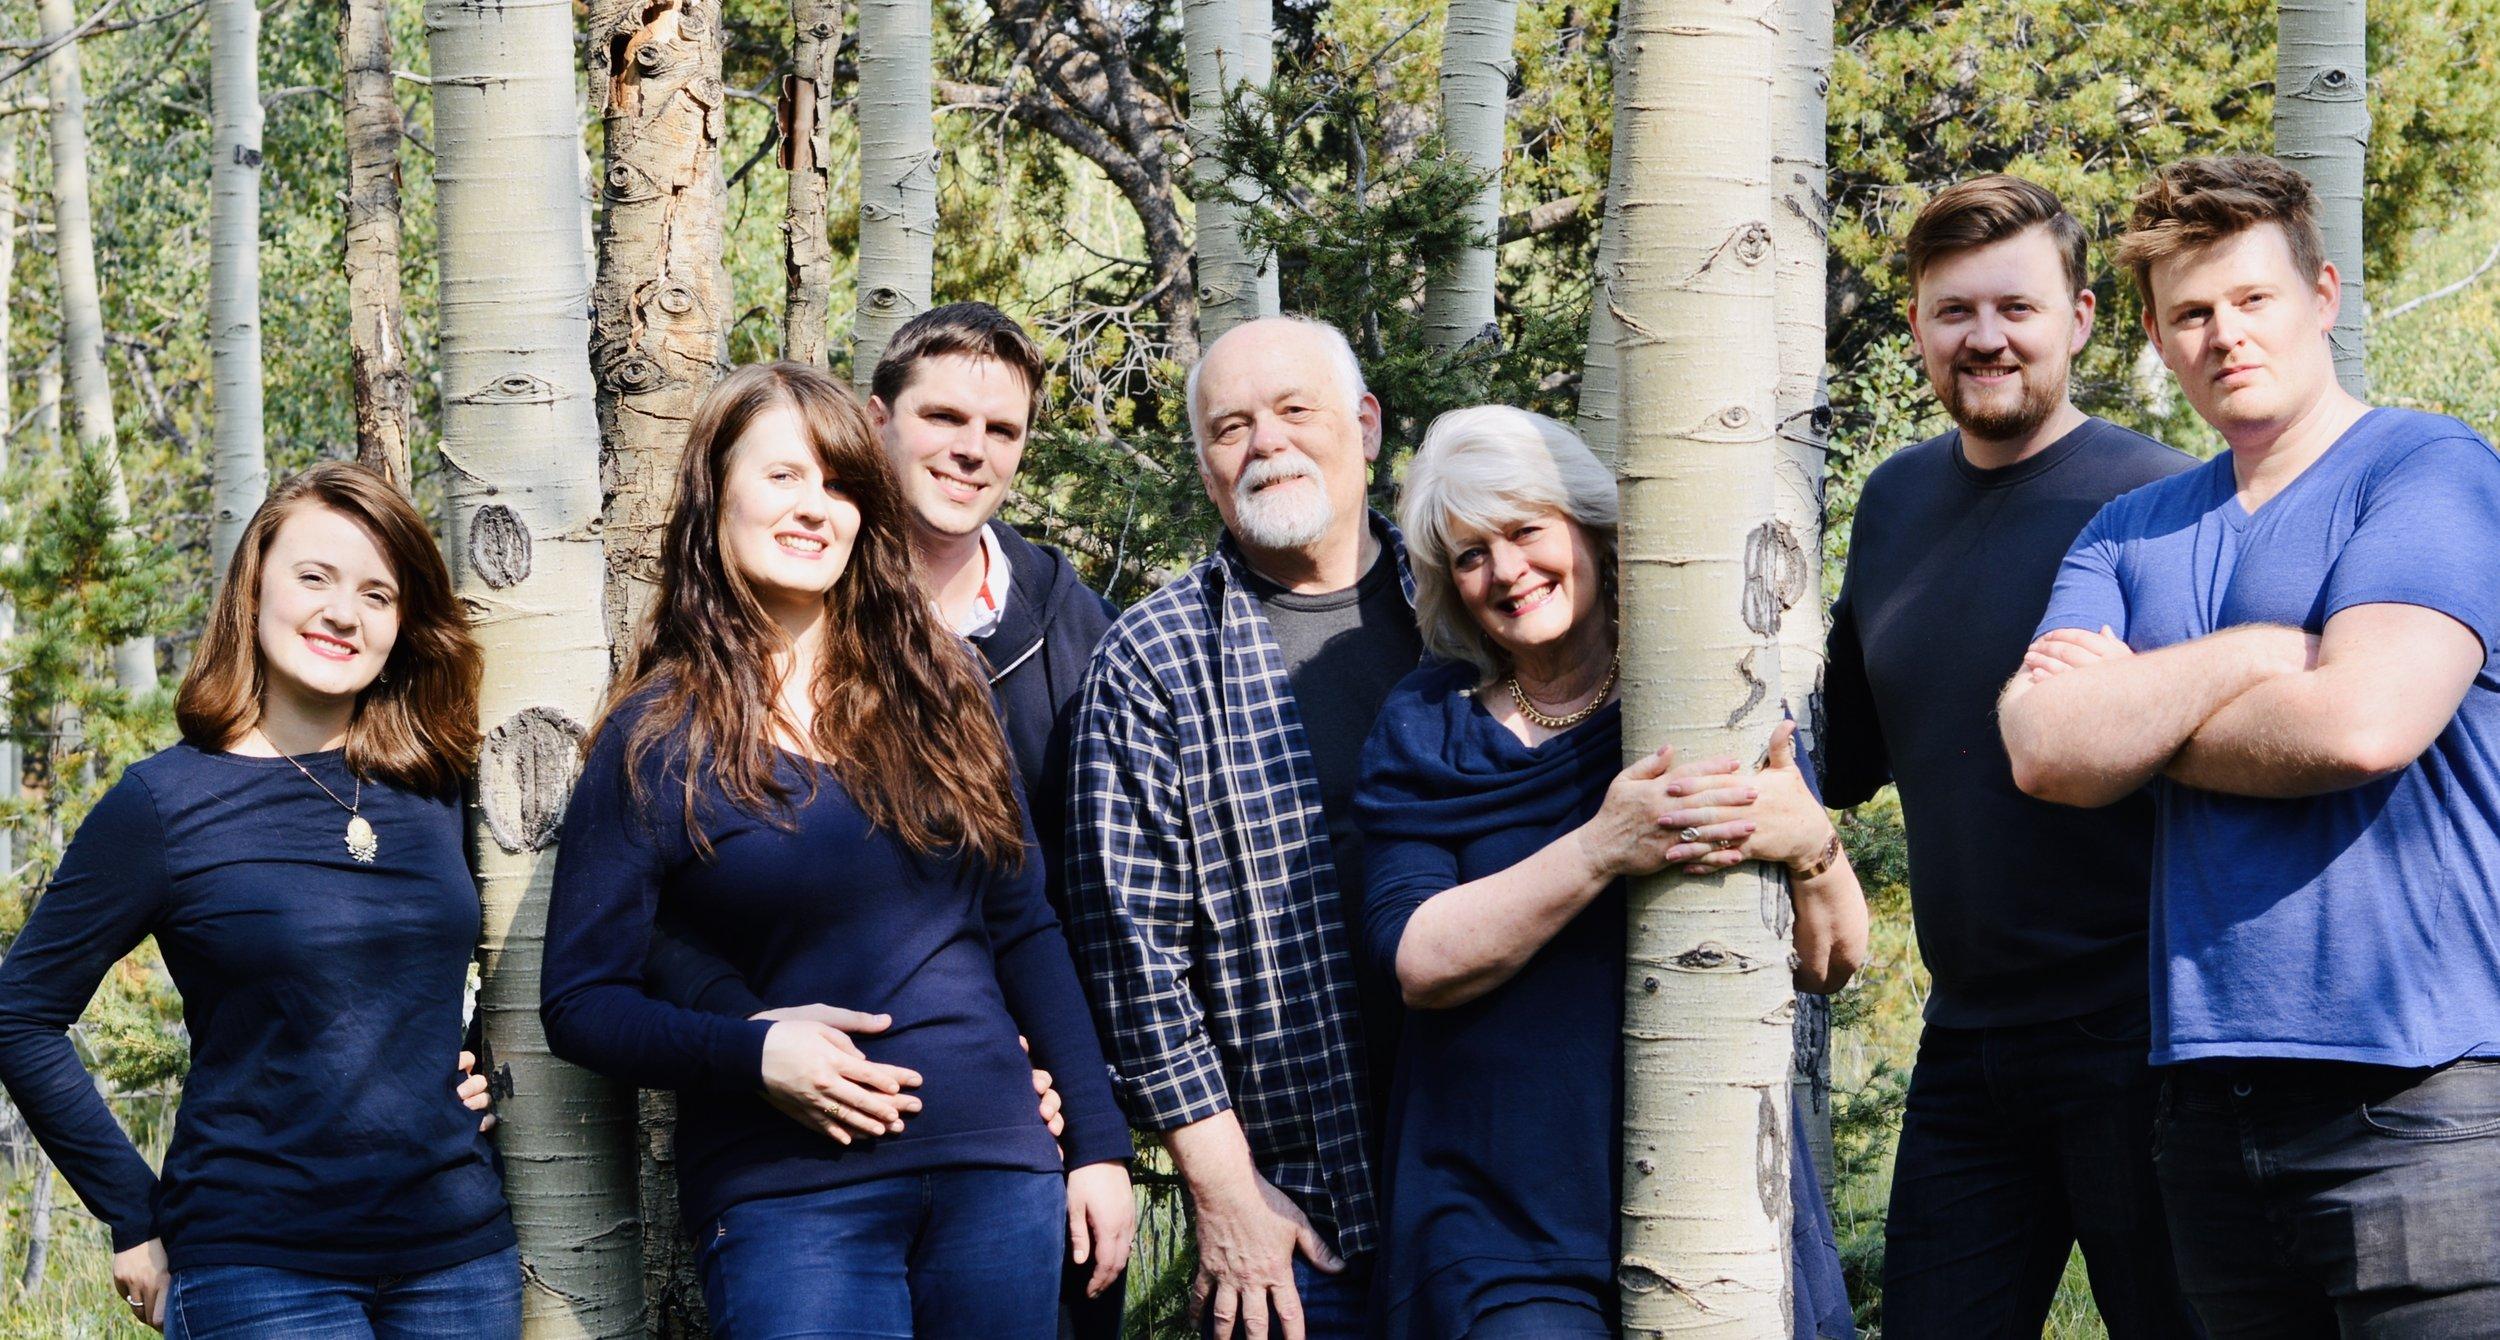 Family Day, A Couple of Years ago! Joy, Sarah, Thomas, Clay, me, Joel, Nathan